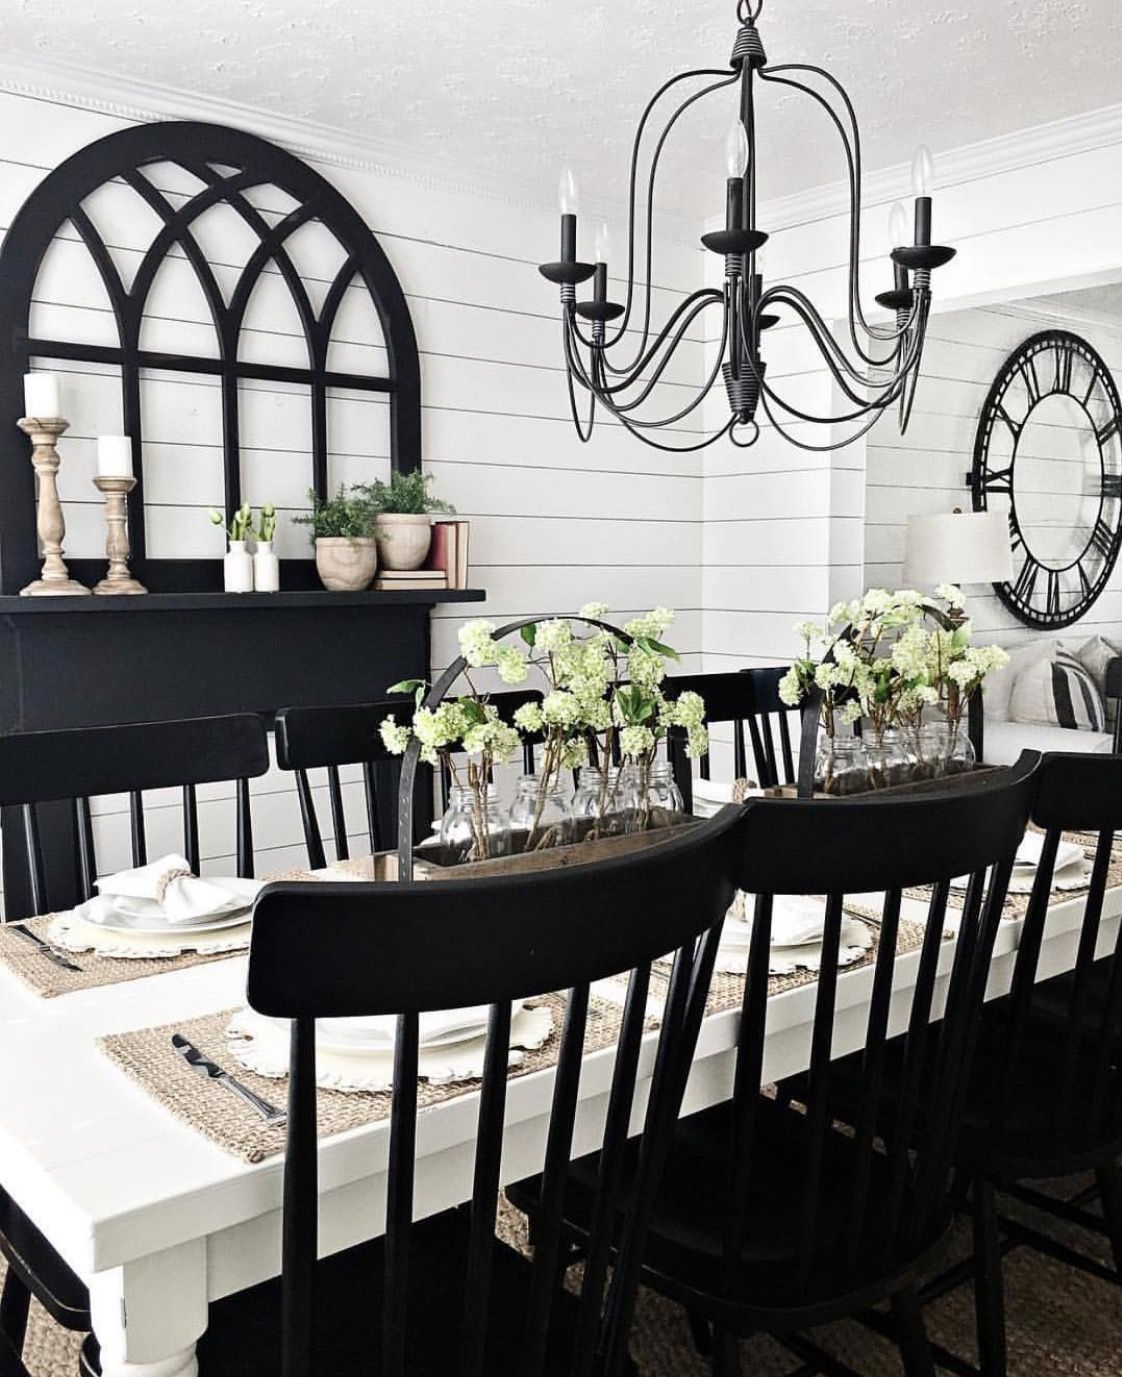 46 Popular Farmhouse Dining Room Design Ideas Trend 2019: Joanna Gaines Wannabe In 2019